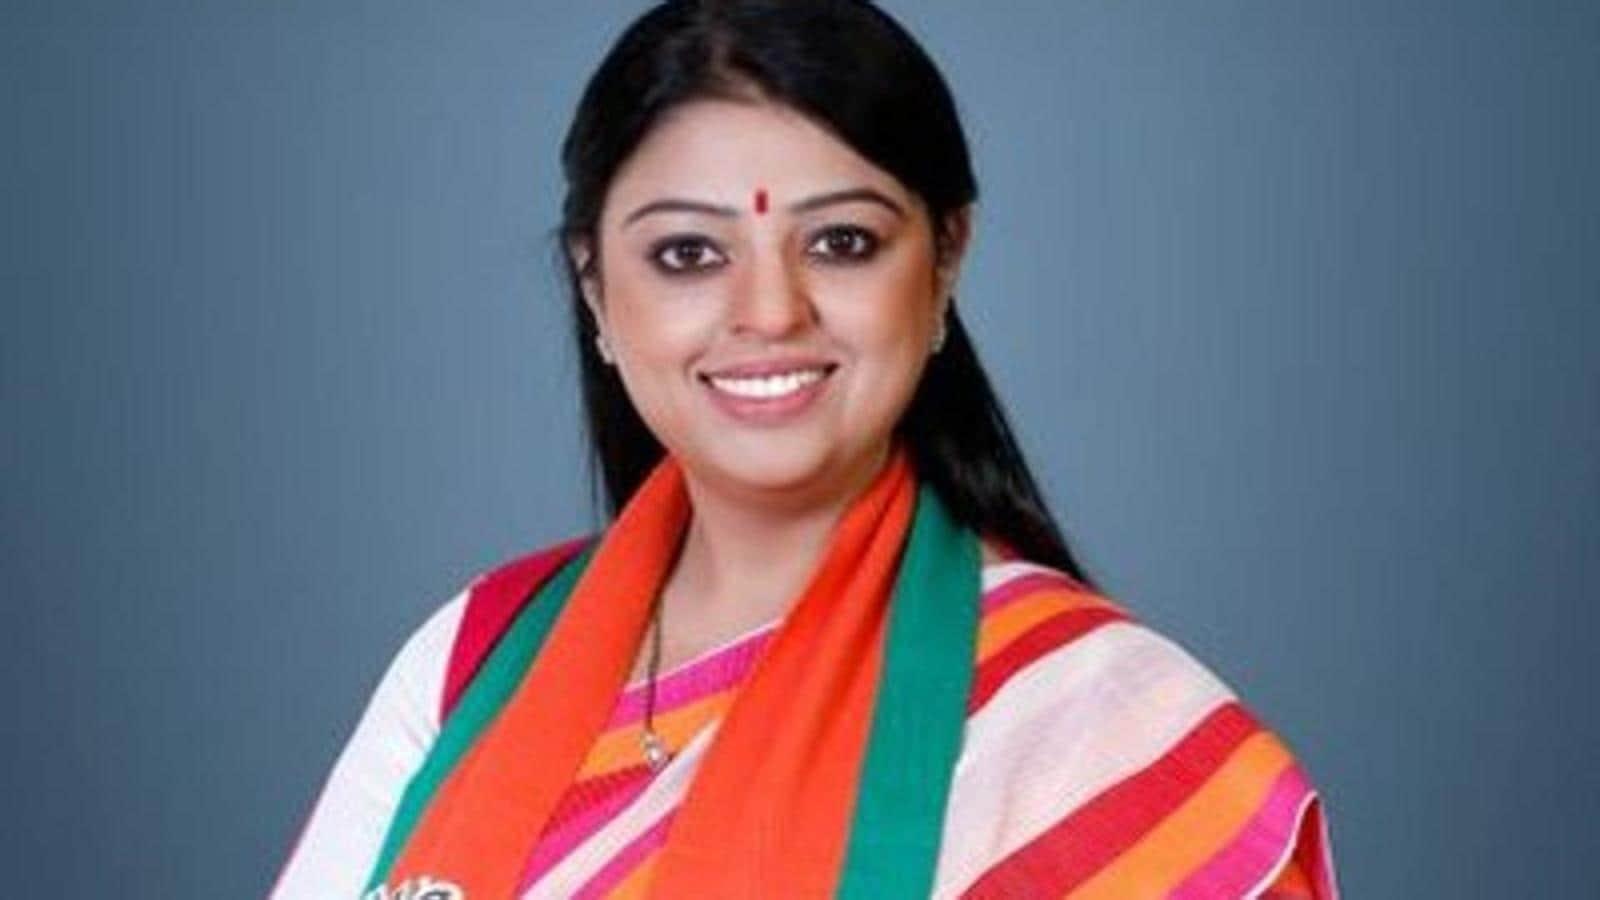 BJP fields Priyanka Tibrewal to take on Banerjee in Bhabanipur bye-elections